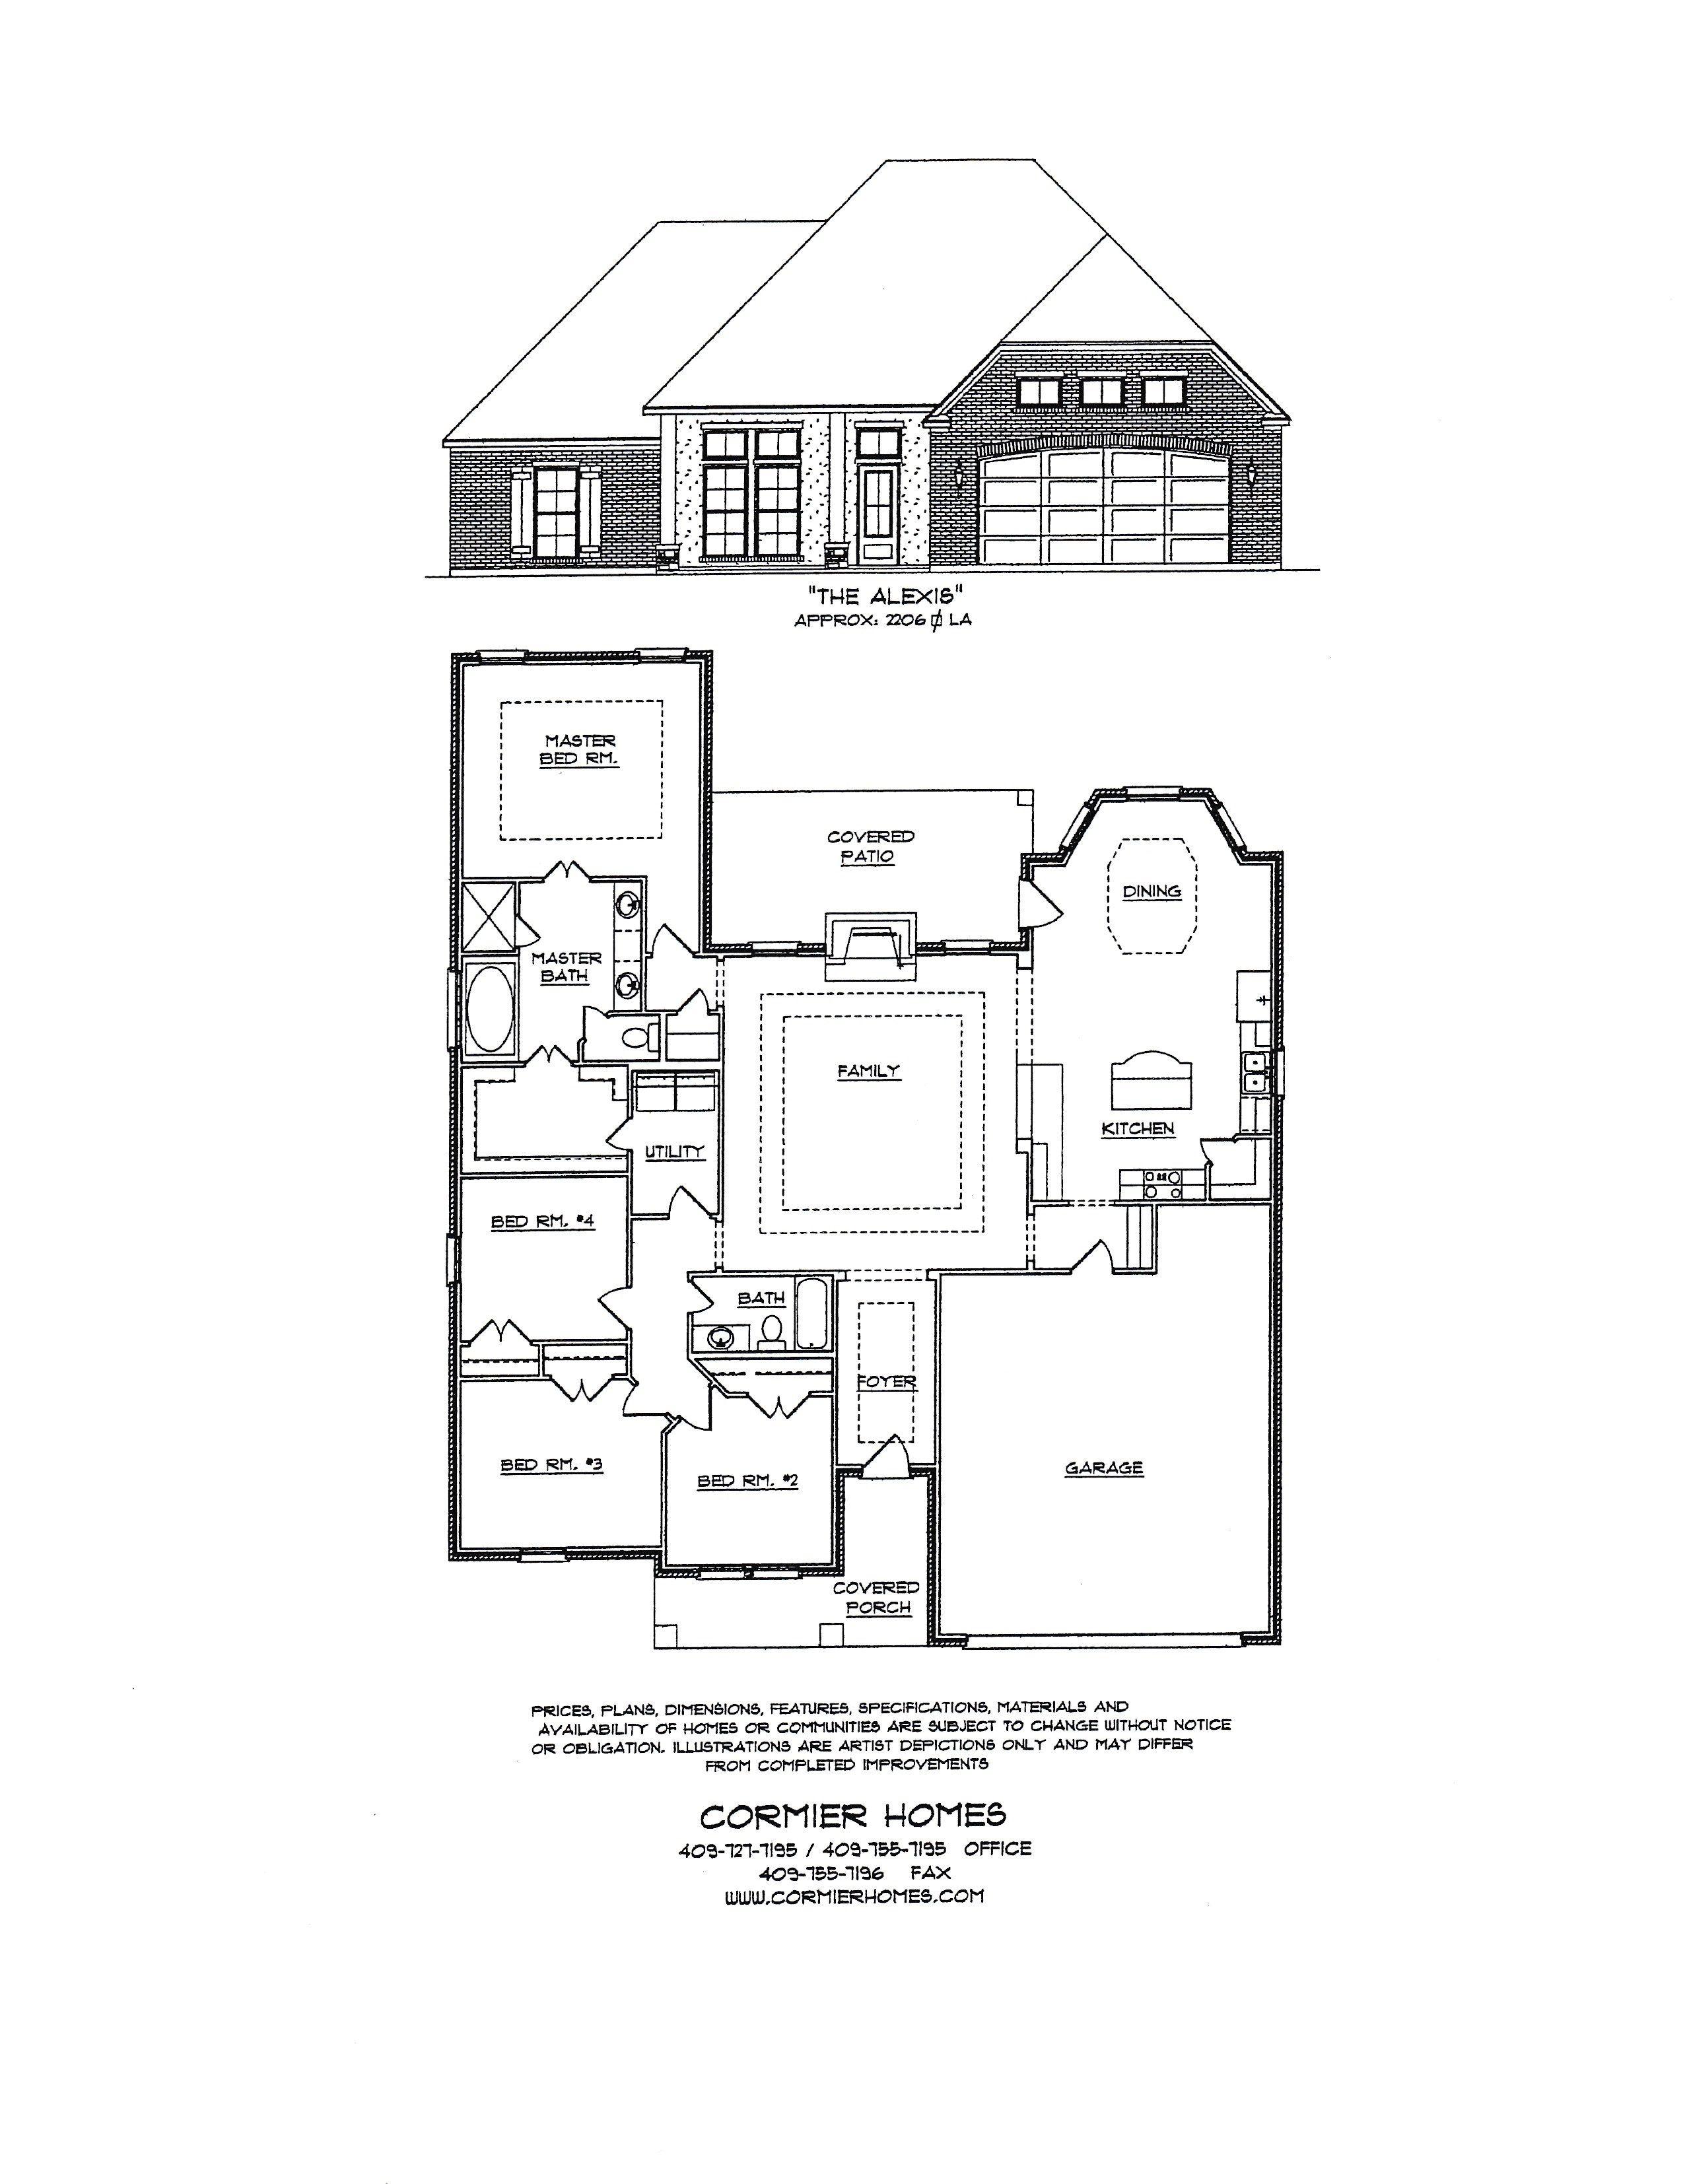 49 Westwood Cormier House Plans Ideas House Plans How To Plan Floor Plans